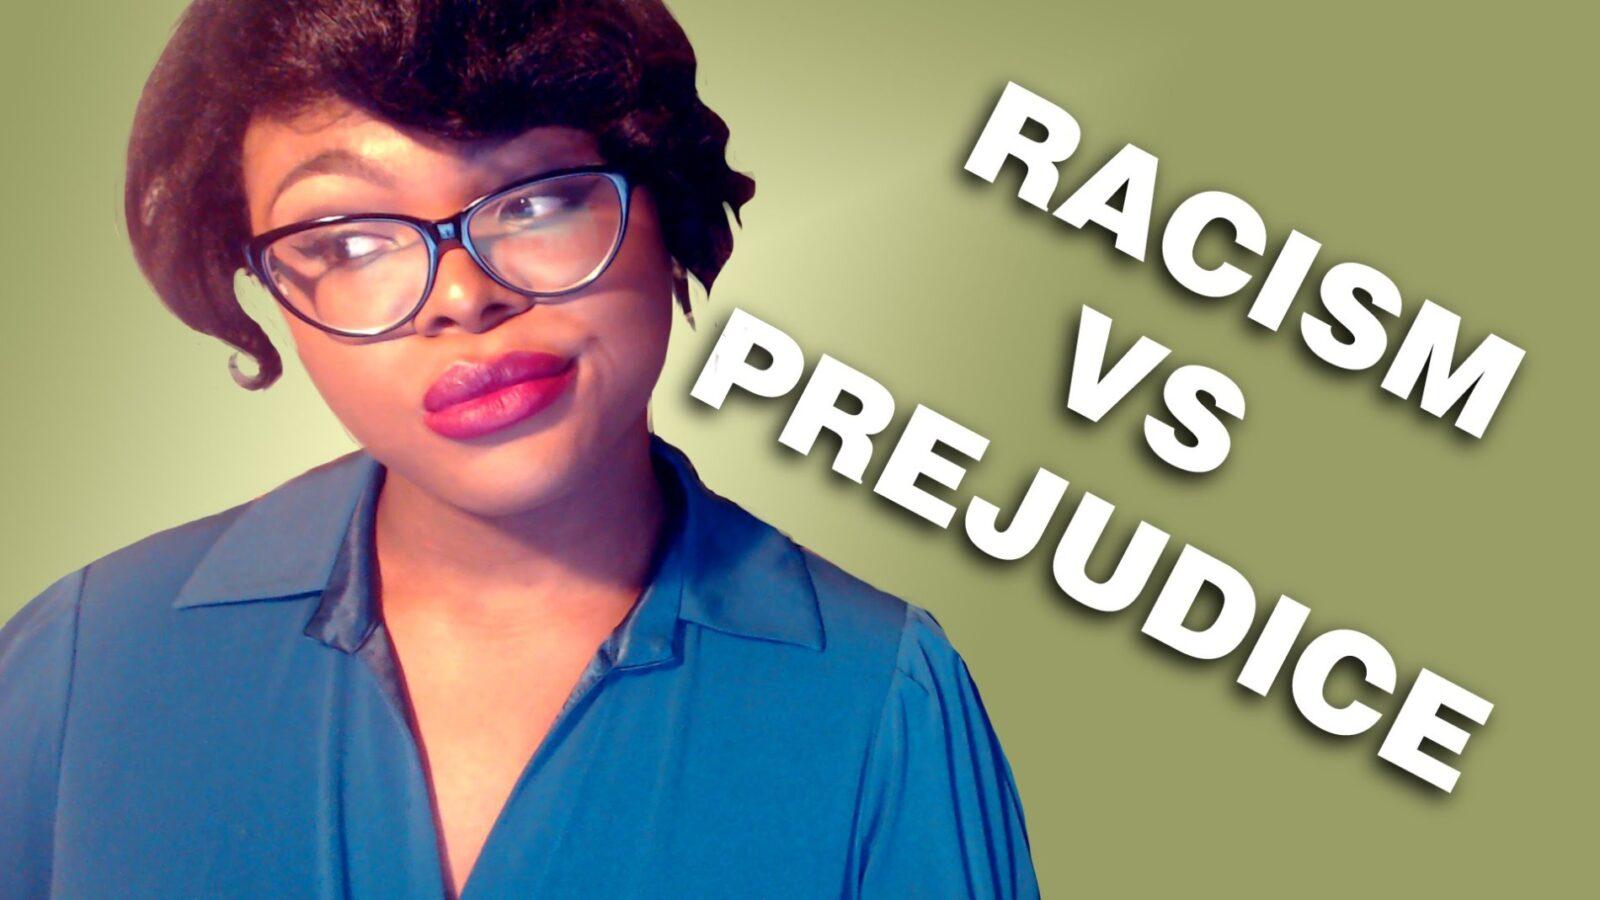 Prejudice, Discrimination, Bigotry and Racism